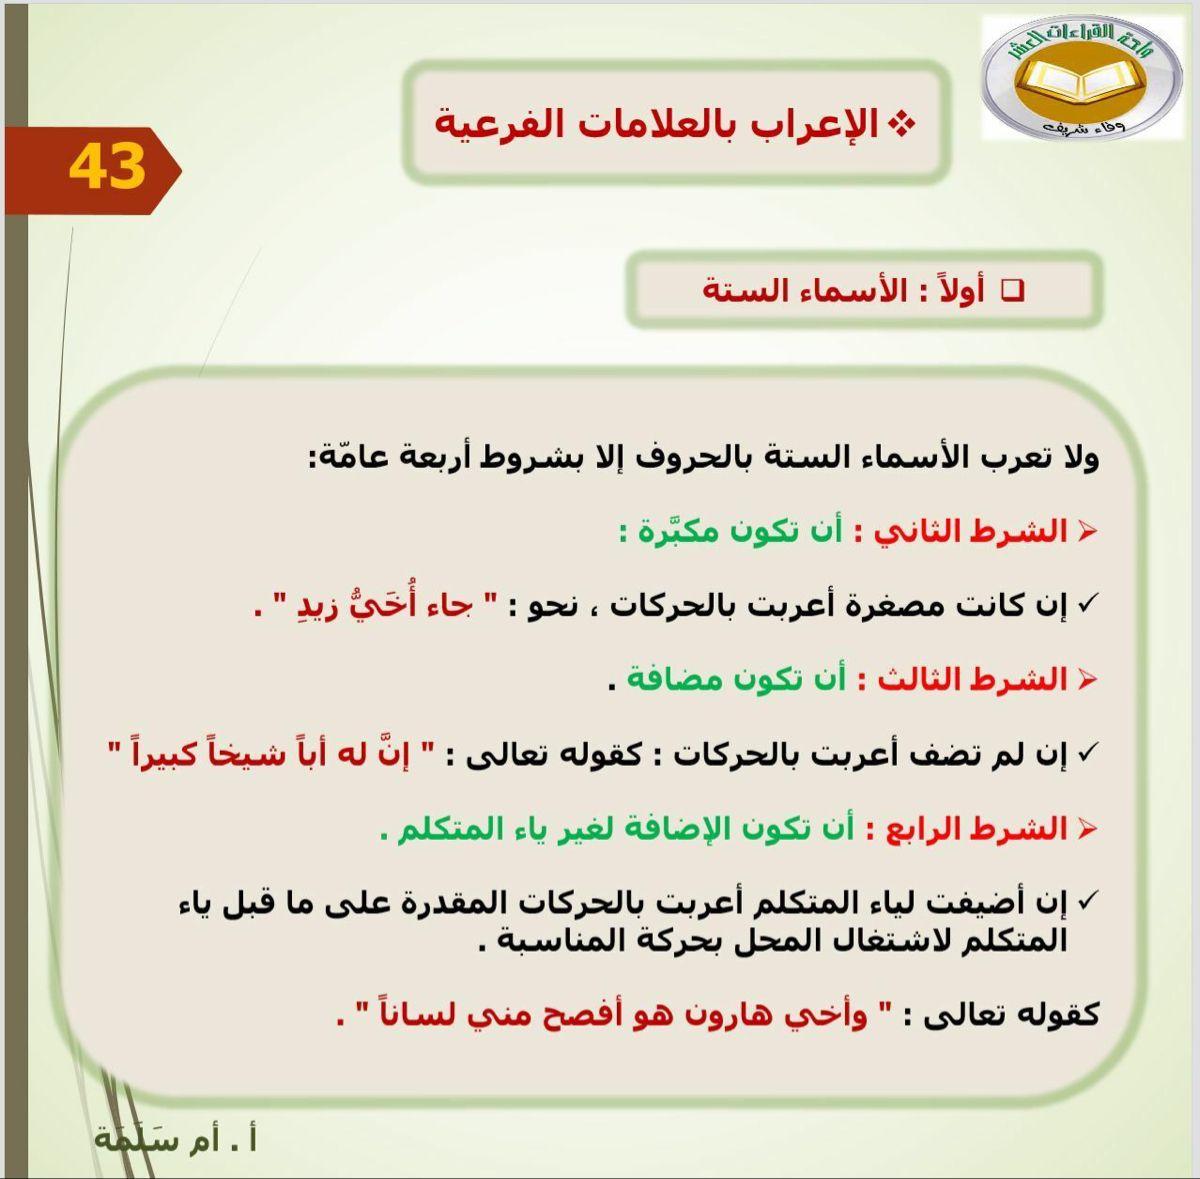 Pin By Soso On علامات الإعراب Language Arabic Language Airline